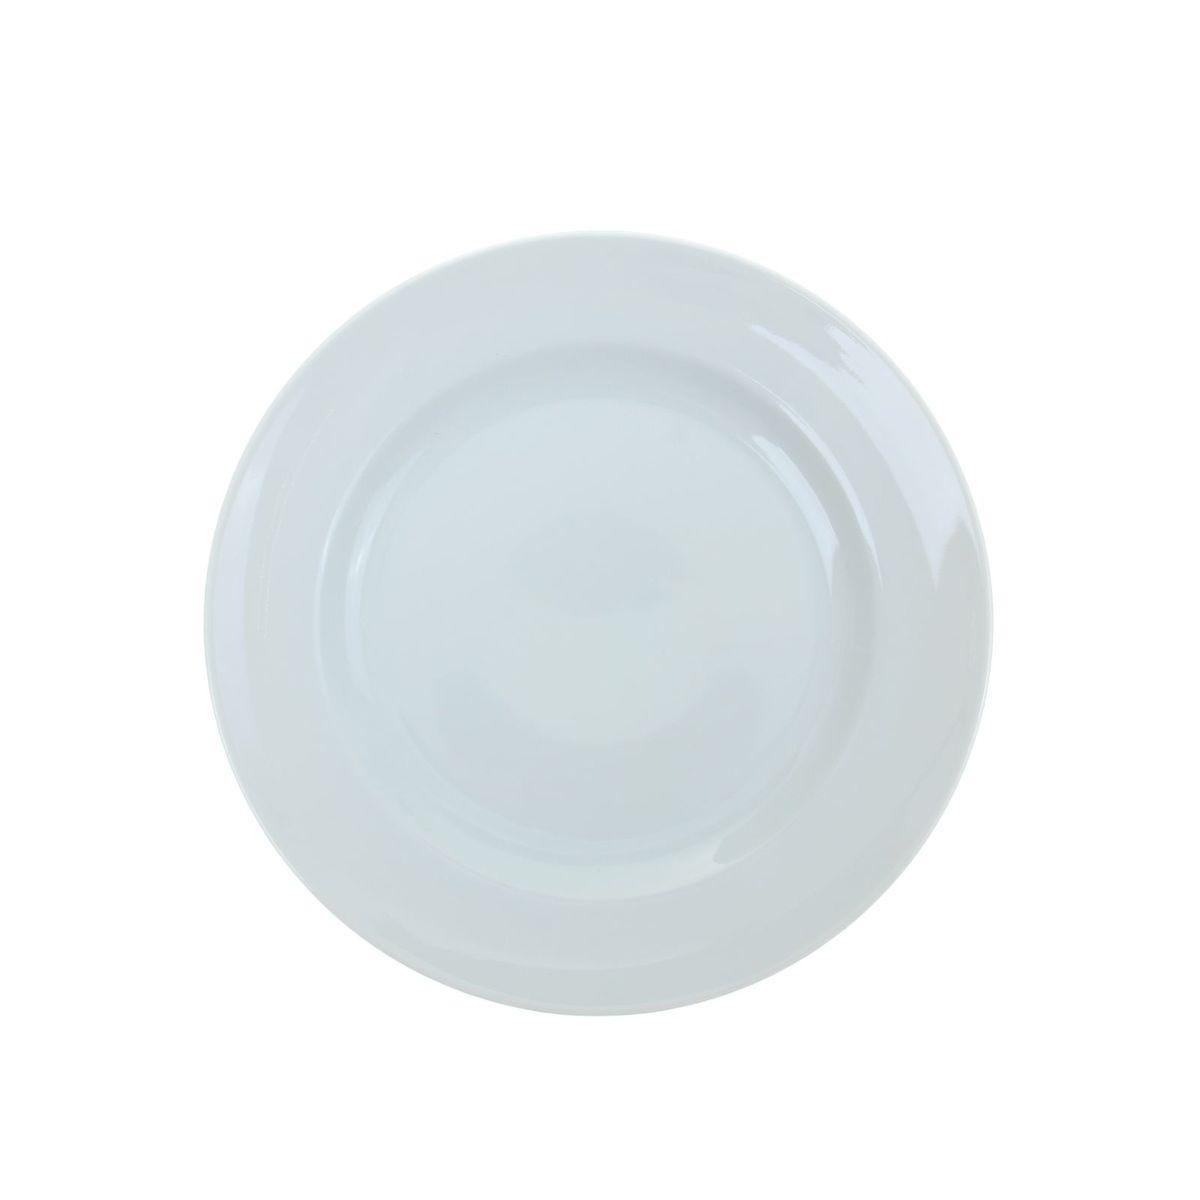 Тарелка мелкая Идиллия. Белье, диаметр 24 см тарелка мелкая идиллия ромашка диаметр 20 см 5с0189